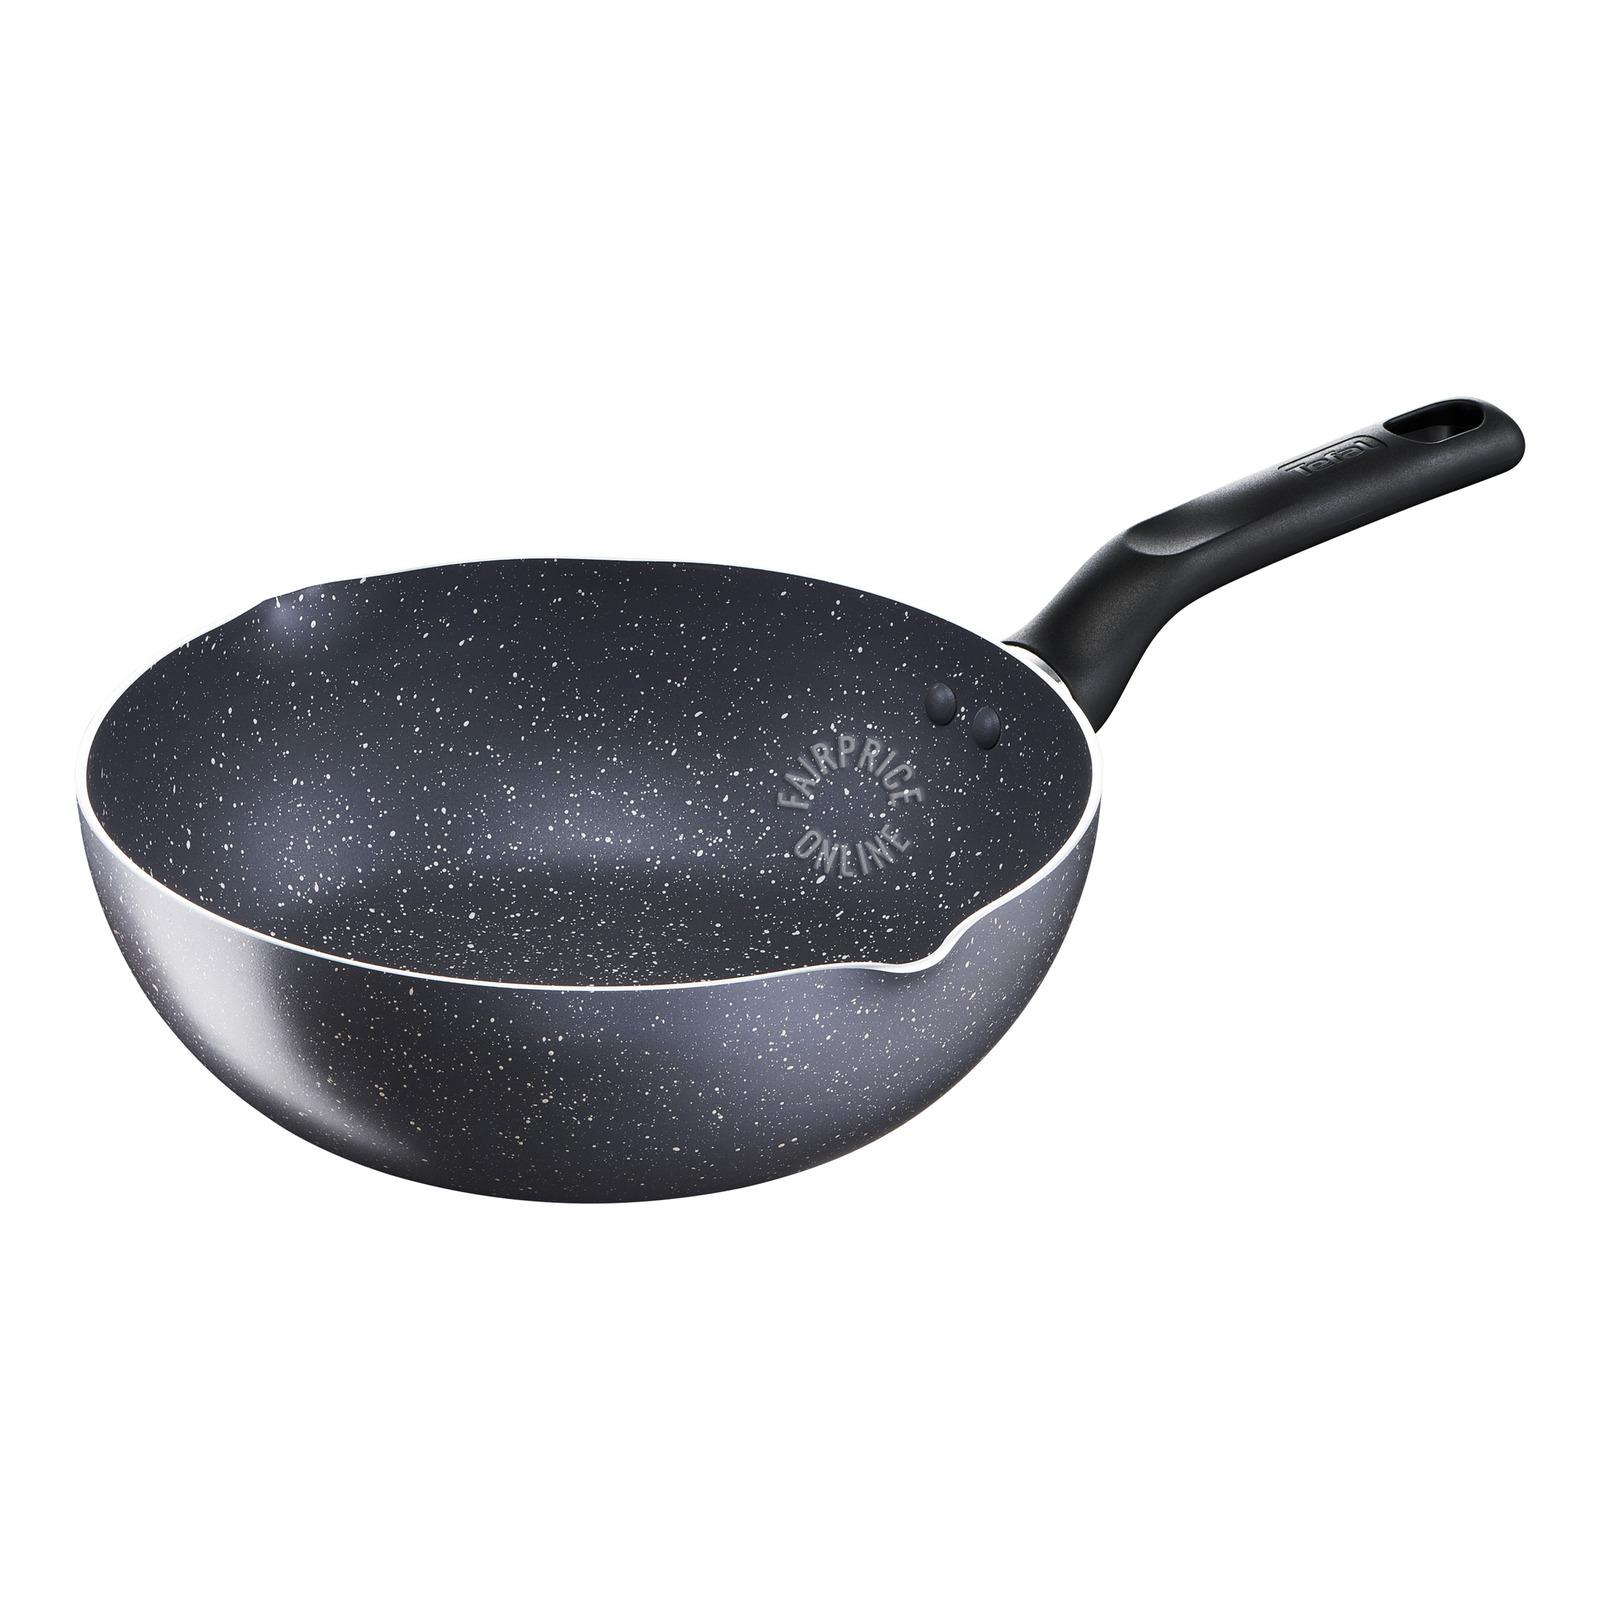 Tefal Natura Deep Frypan - 26cm